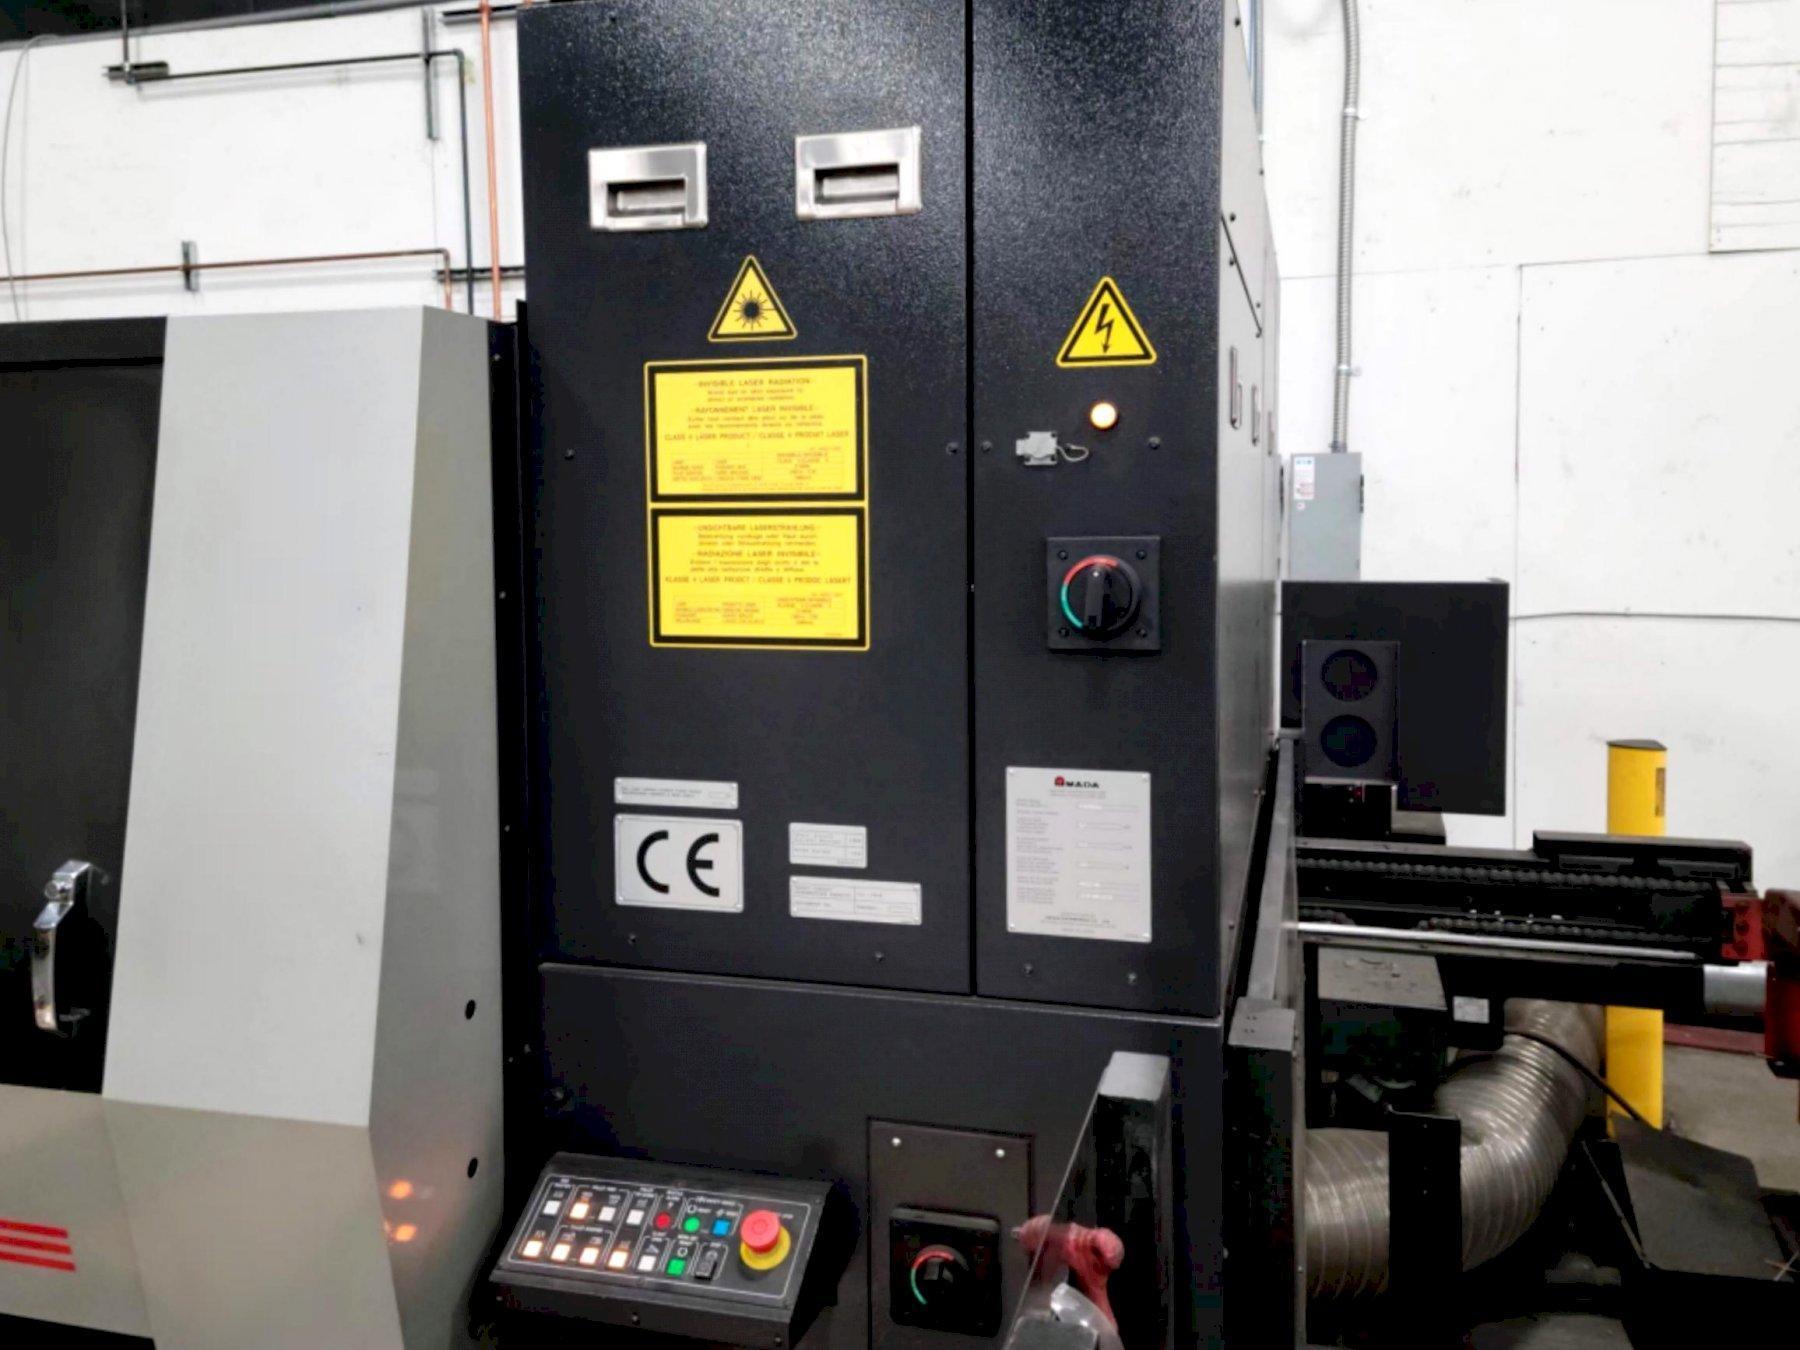 Amada ENSIS-3015AJ 2016 2.1kw Fiber Laser